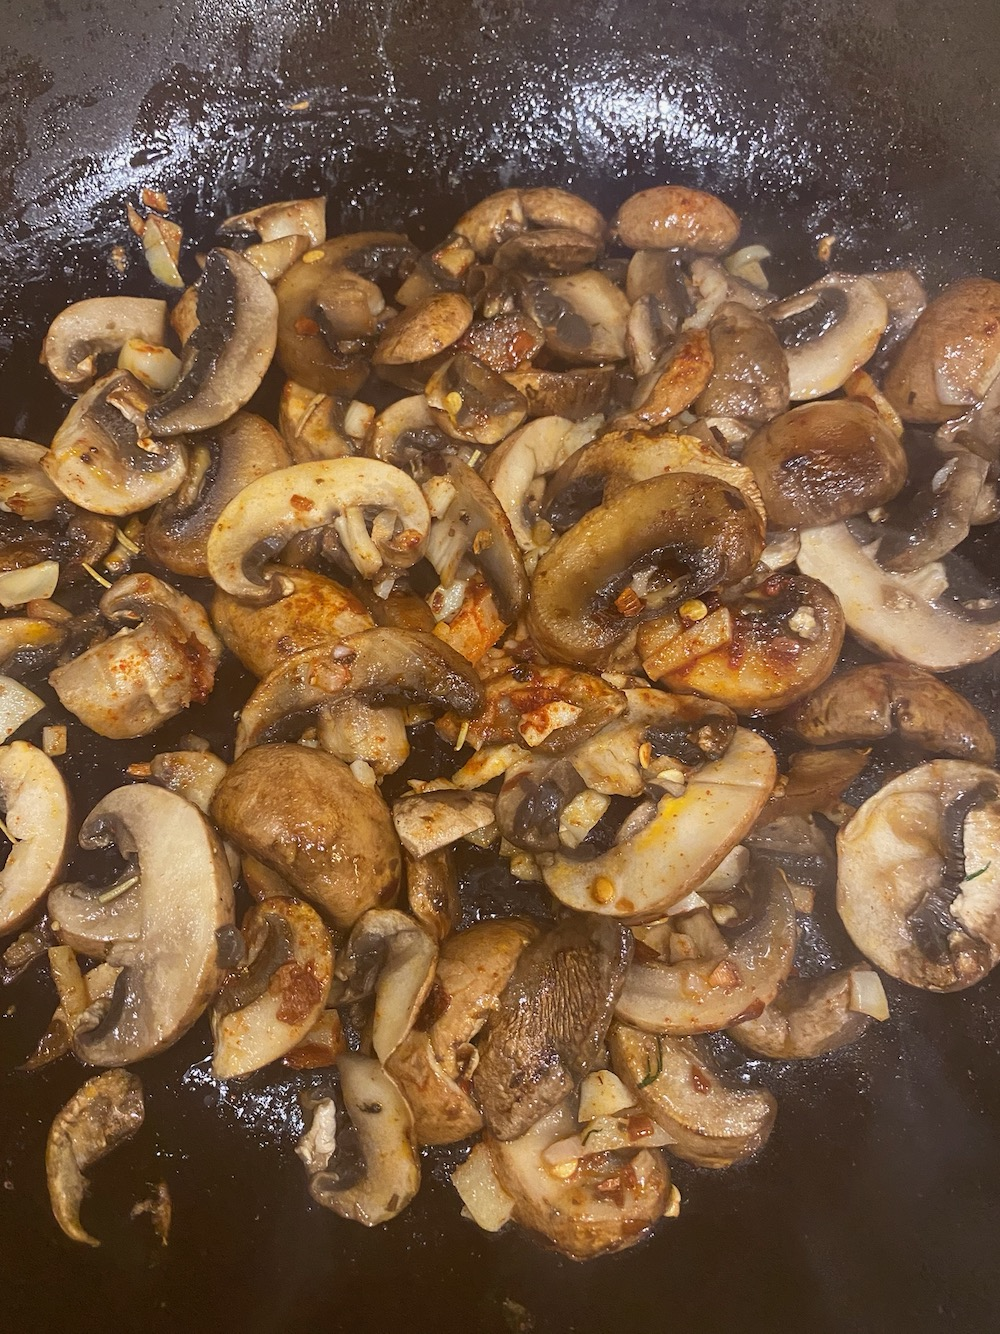 Mushrooms are sautéing.